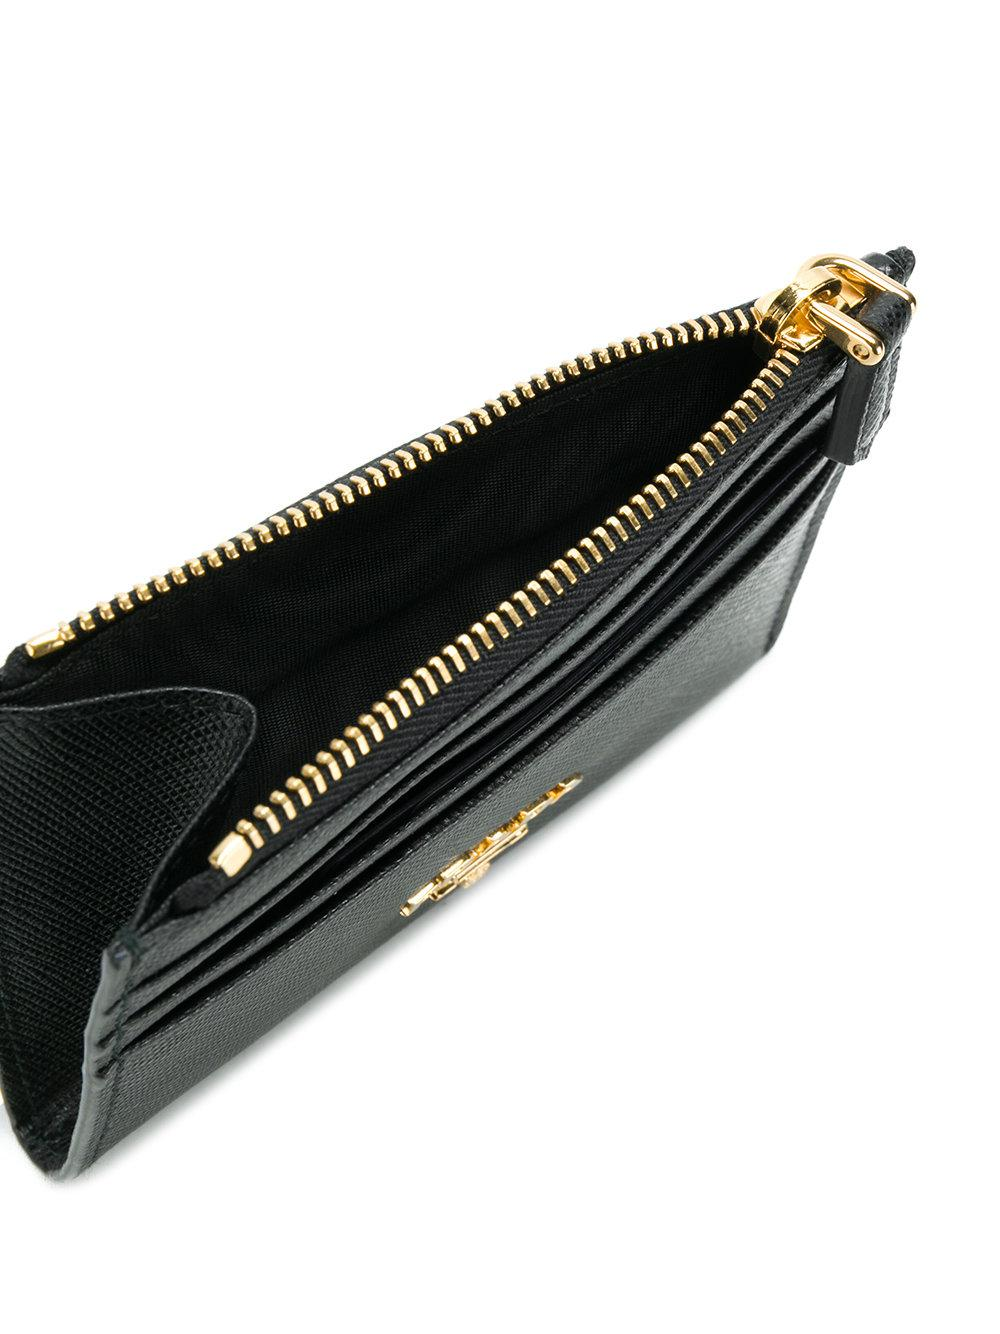 4618955e3b76 hot prada card holder 1m0208 black saffiano calf leather 57fc3 a684e; promo  code for lyst prada saffiano zip cardholder in black 2d546 2563f